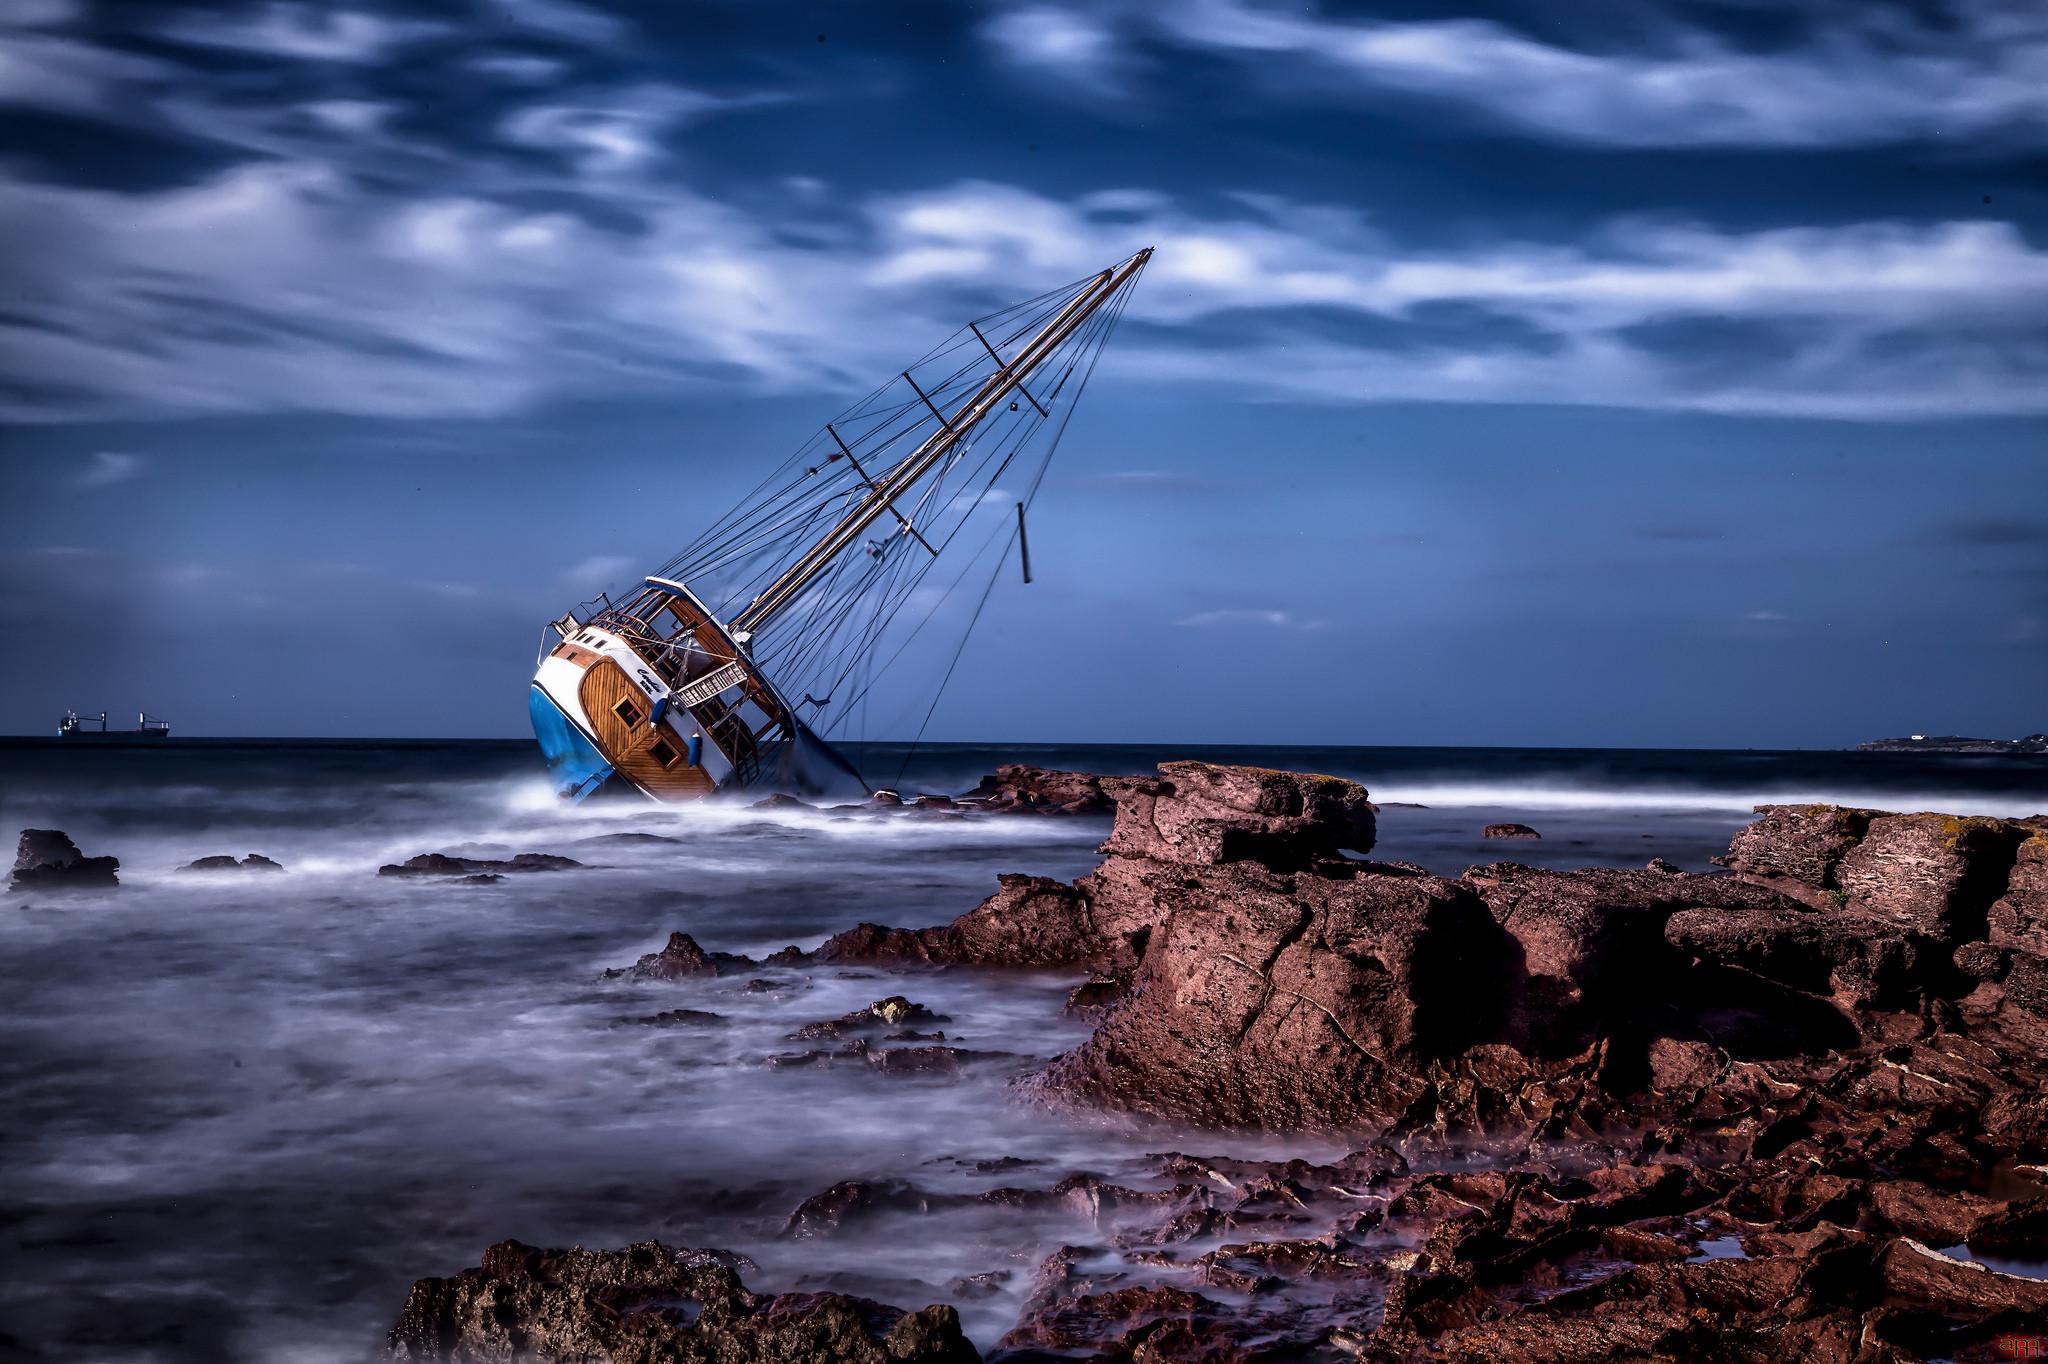 обои Гибель Каролины, Каласетта, Сардиния, Италия картинки фото